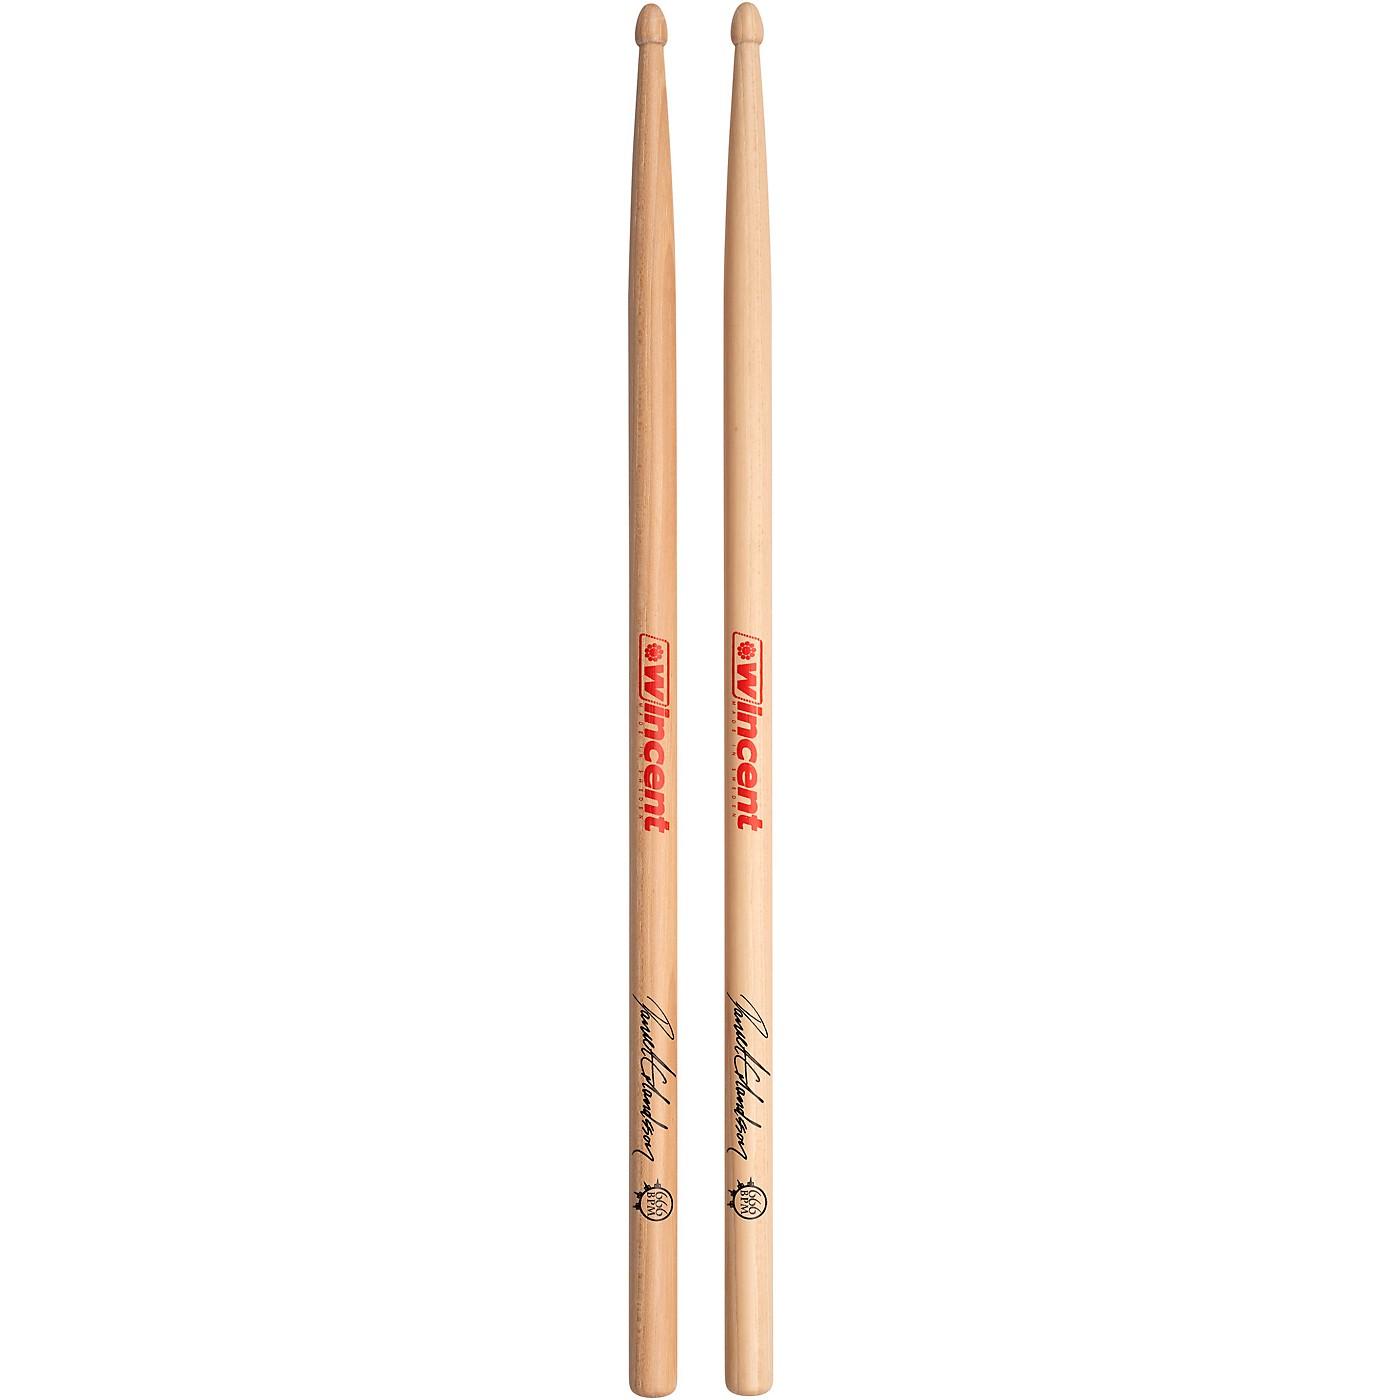 Wincent WDES Daniel Erlandsson 666 BPM Signature Drumsticks Sleeved thumbnail